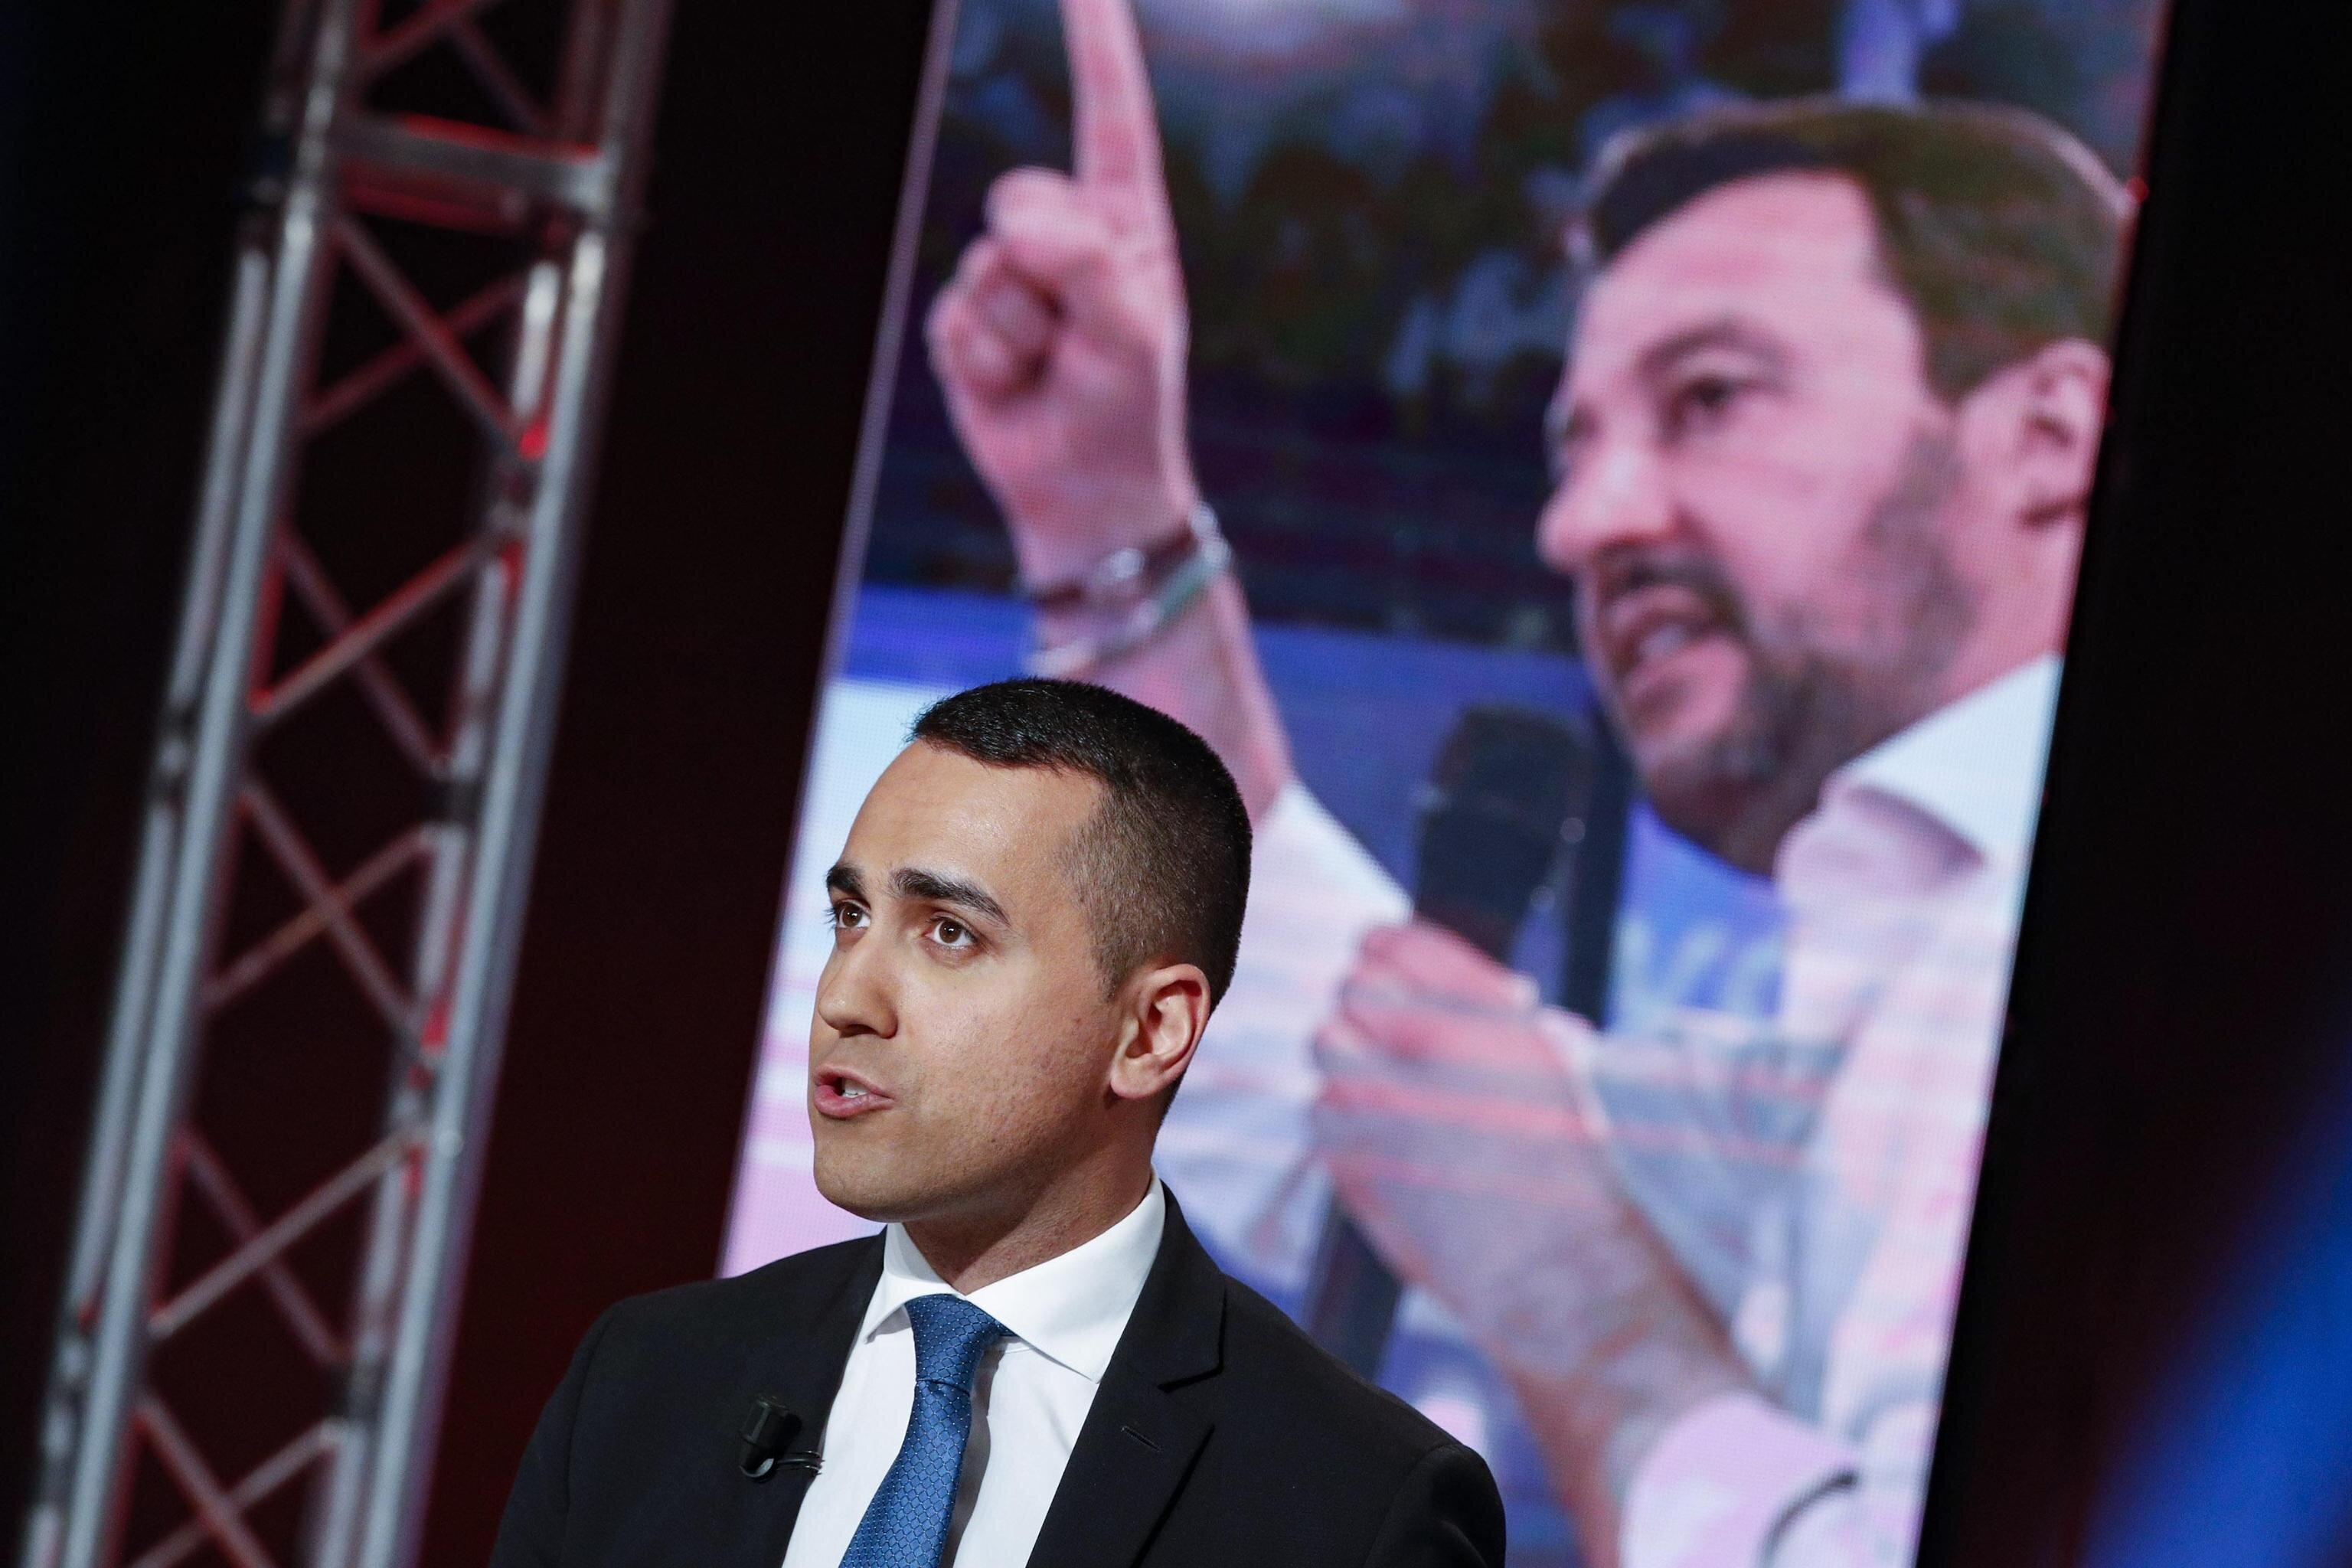 Di Maio a Salvini: datti una